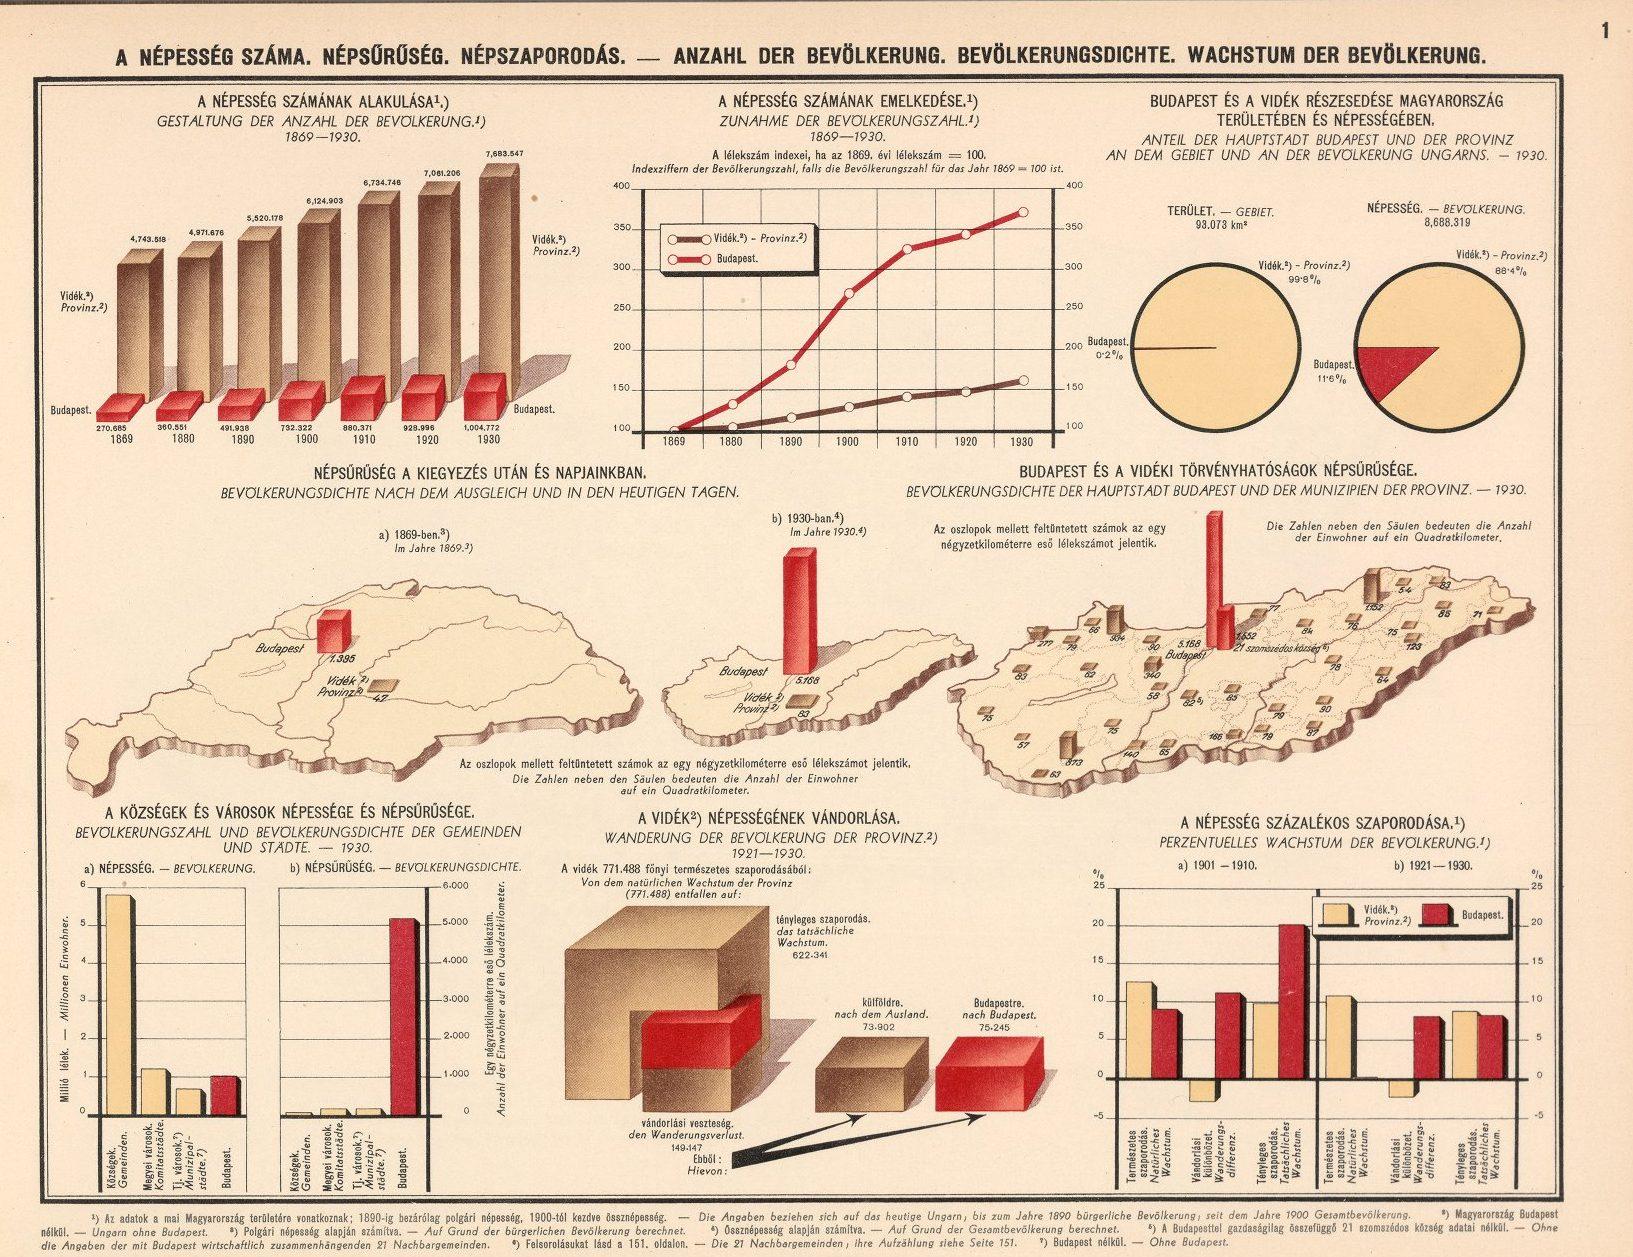 Lajos Illyefalvi Atlas Budapest Statistic